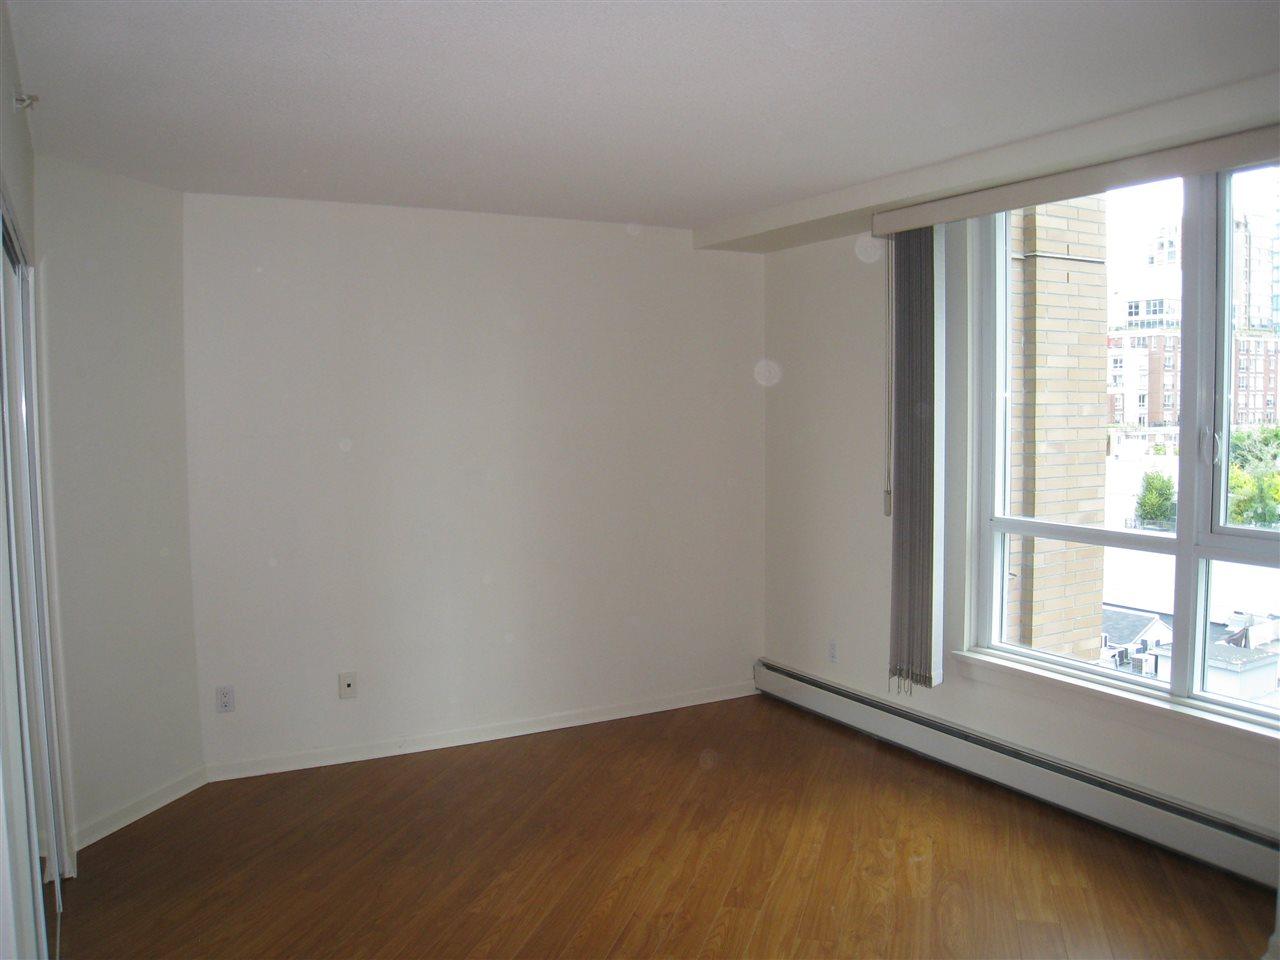 Condo Apartment at 1305 388 DRAKE STREET, Unit 1305, Vancouver West, British Columbia. Image 8